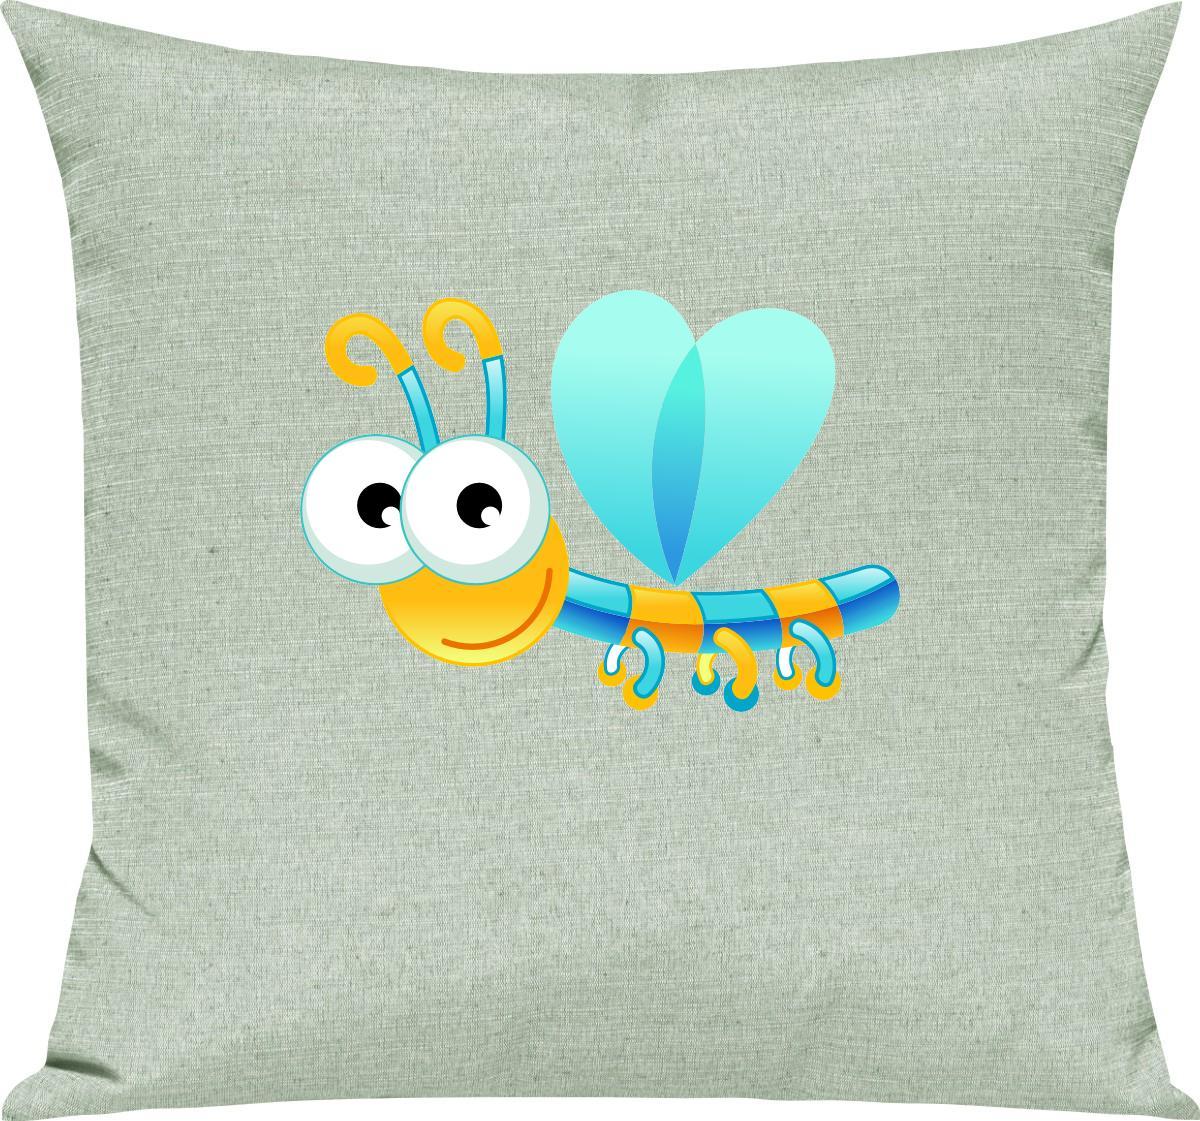 Indexbild 10 - Kinder Kissen, Libelle Insekt Tiere Tier Natur, Kuschelkissen Couch Deko,